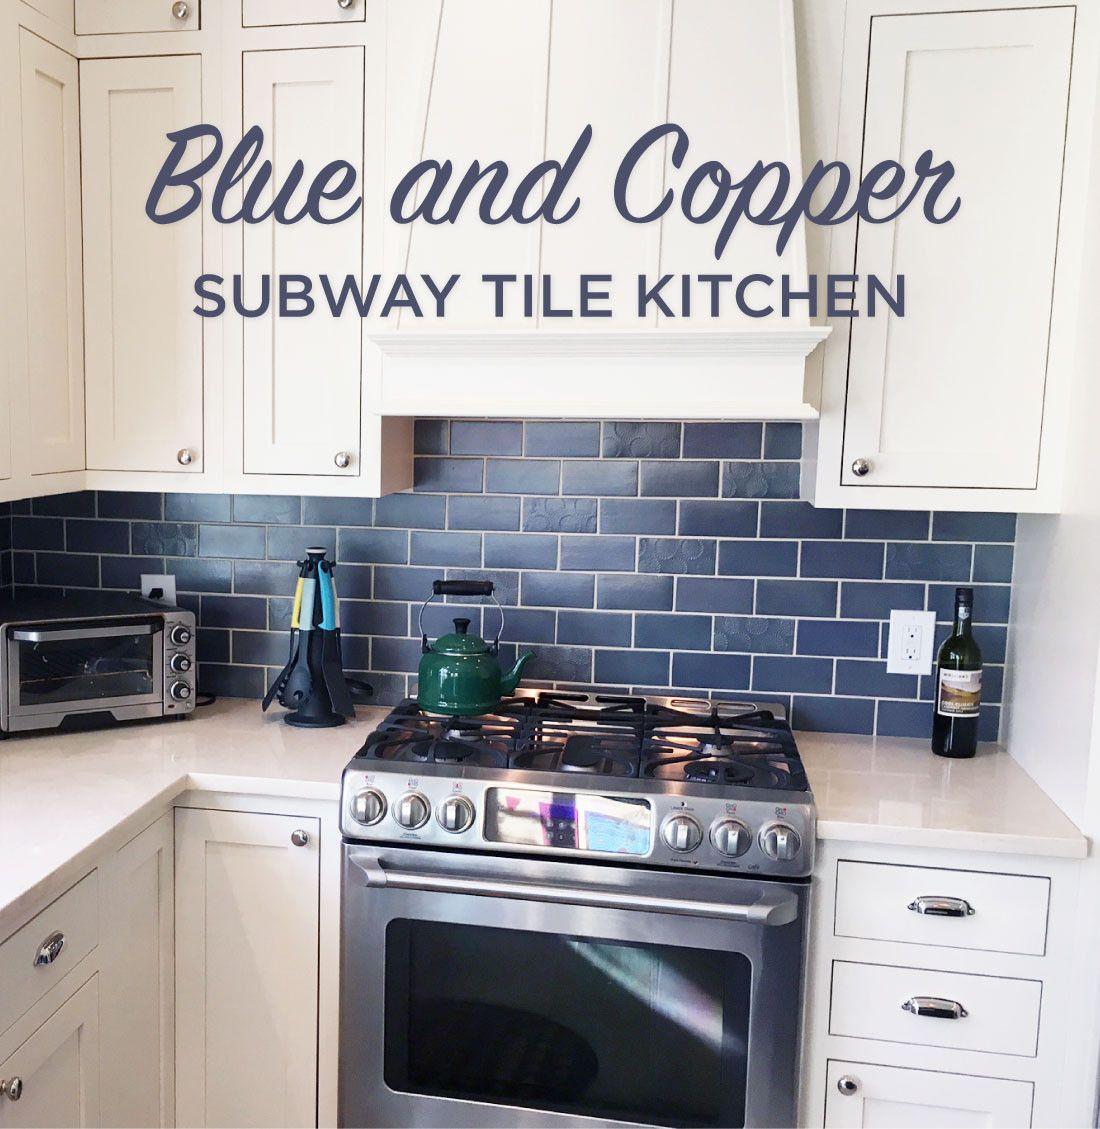 Blue and copper subway tile kitchen kitchen tile inspiration